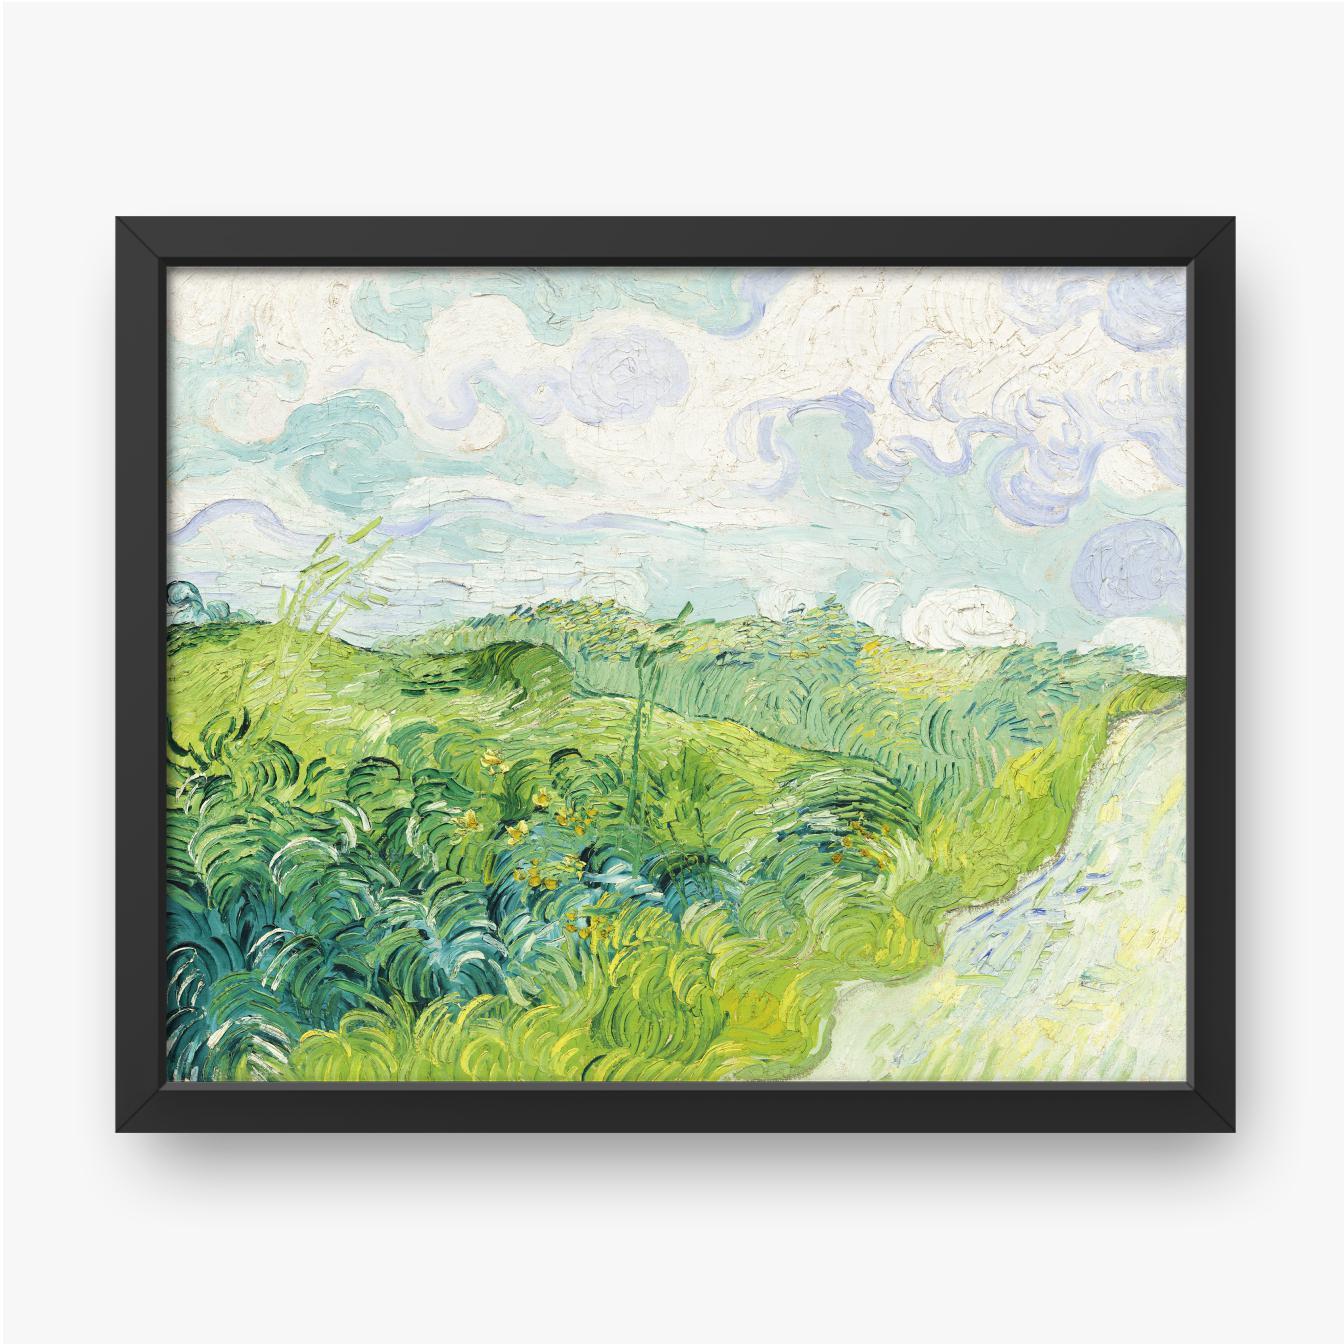 Vincent van Gogh, Grüne Weizenfelder, Auvers, 1890